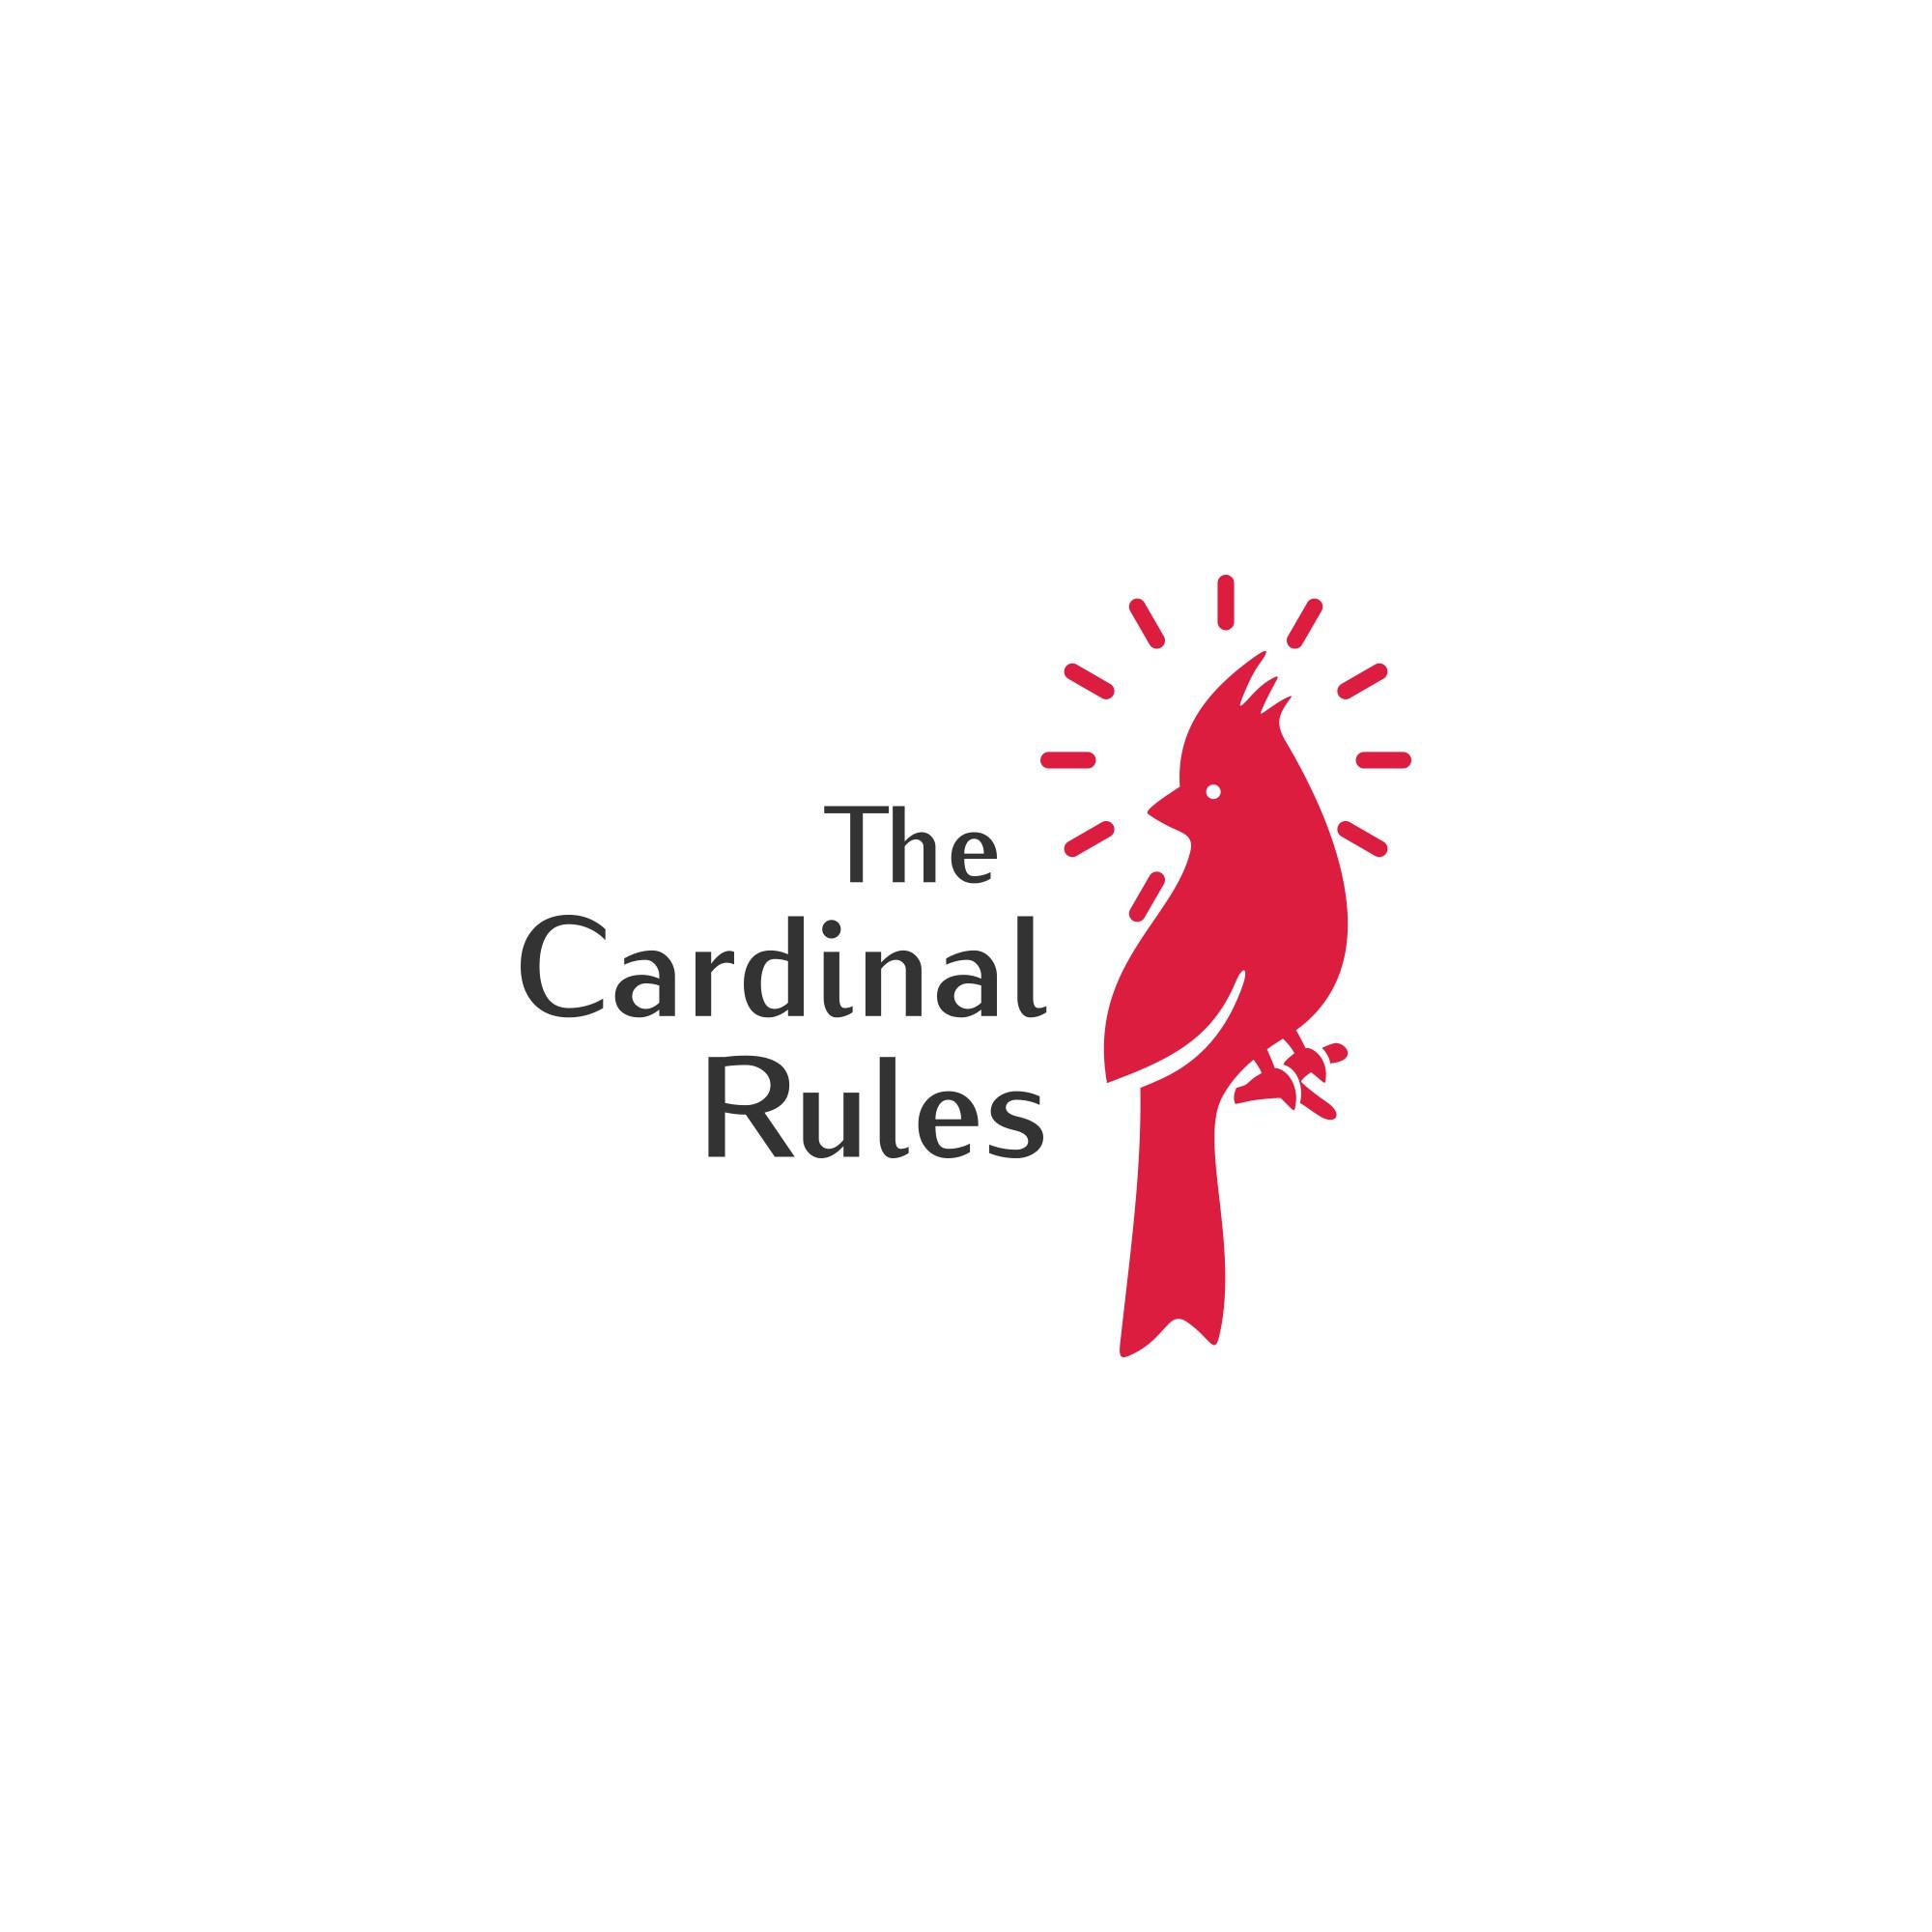 The Cardinal Rules - Brand Identity